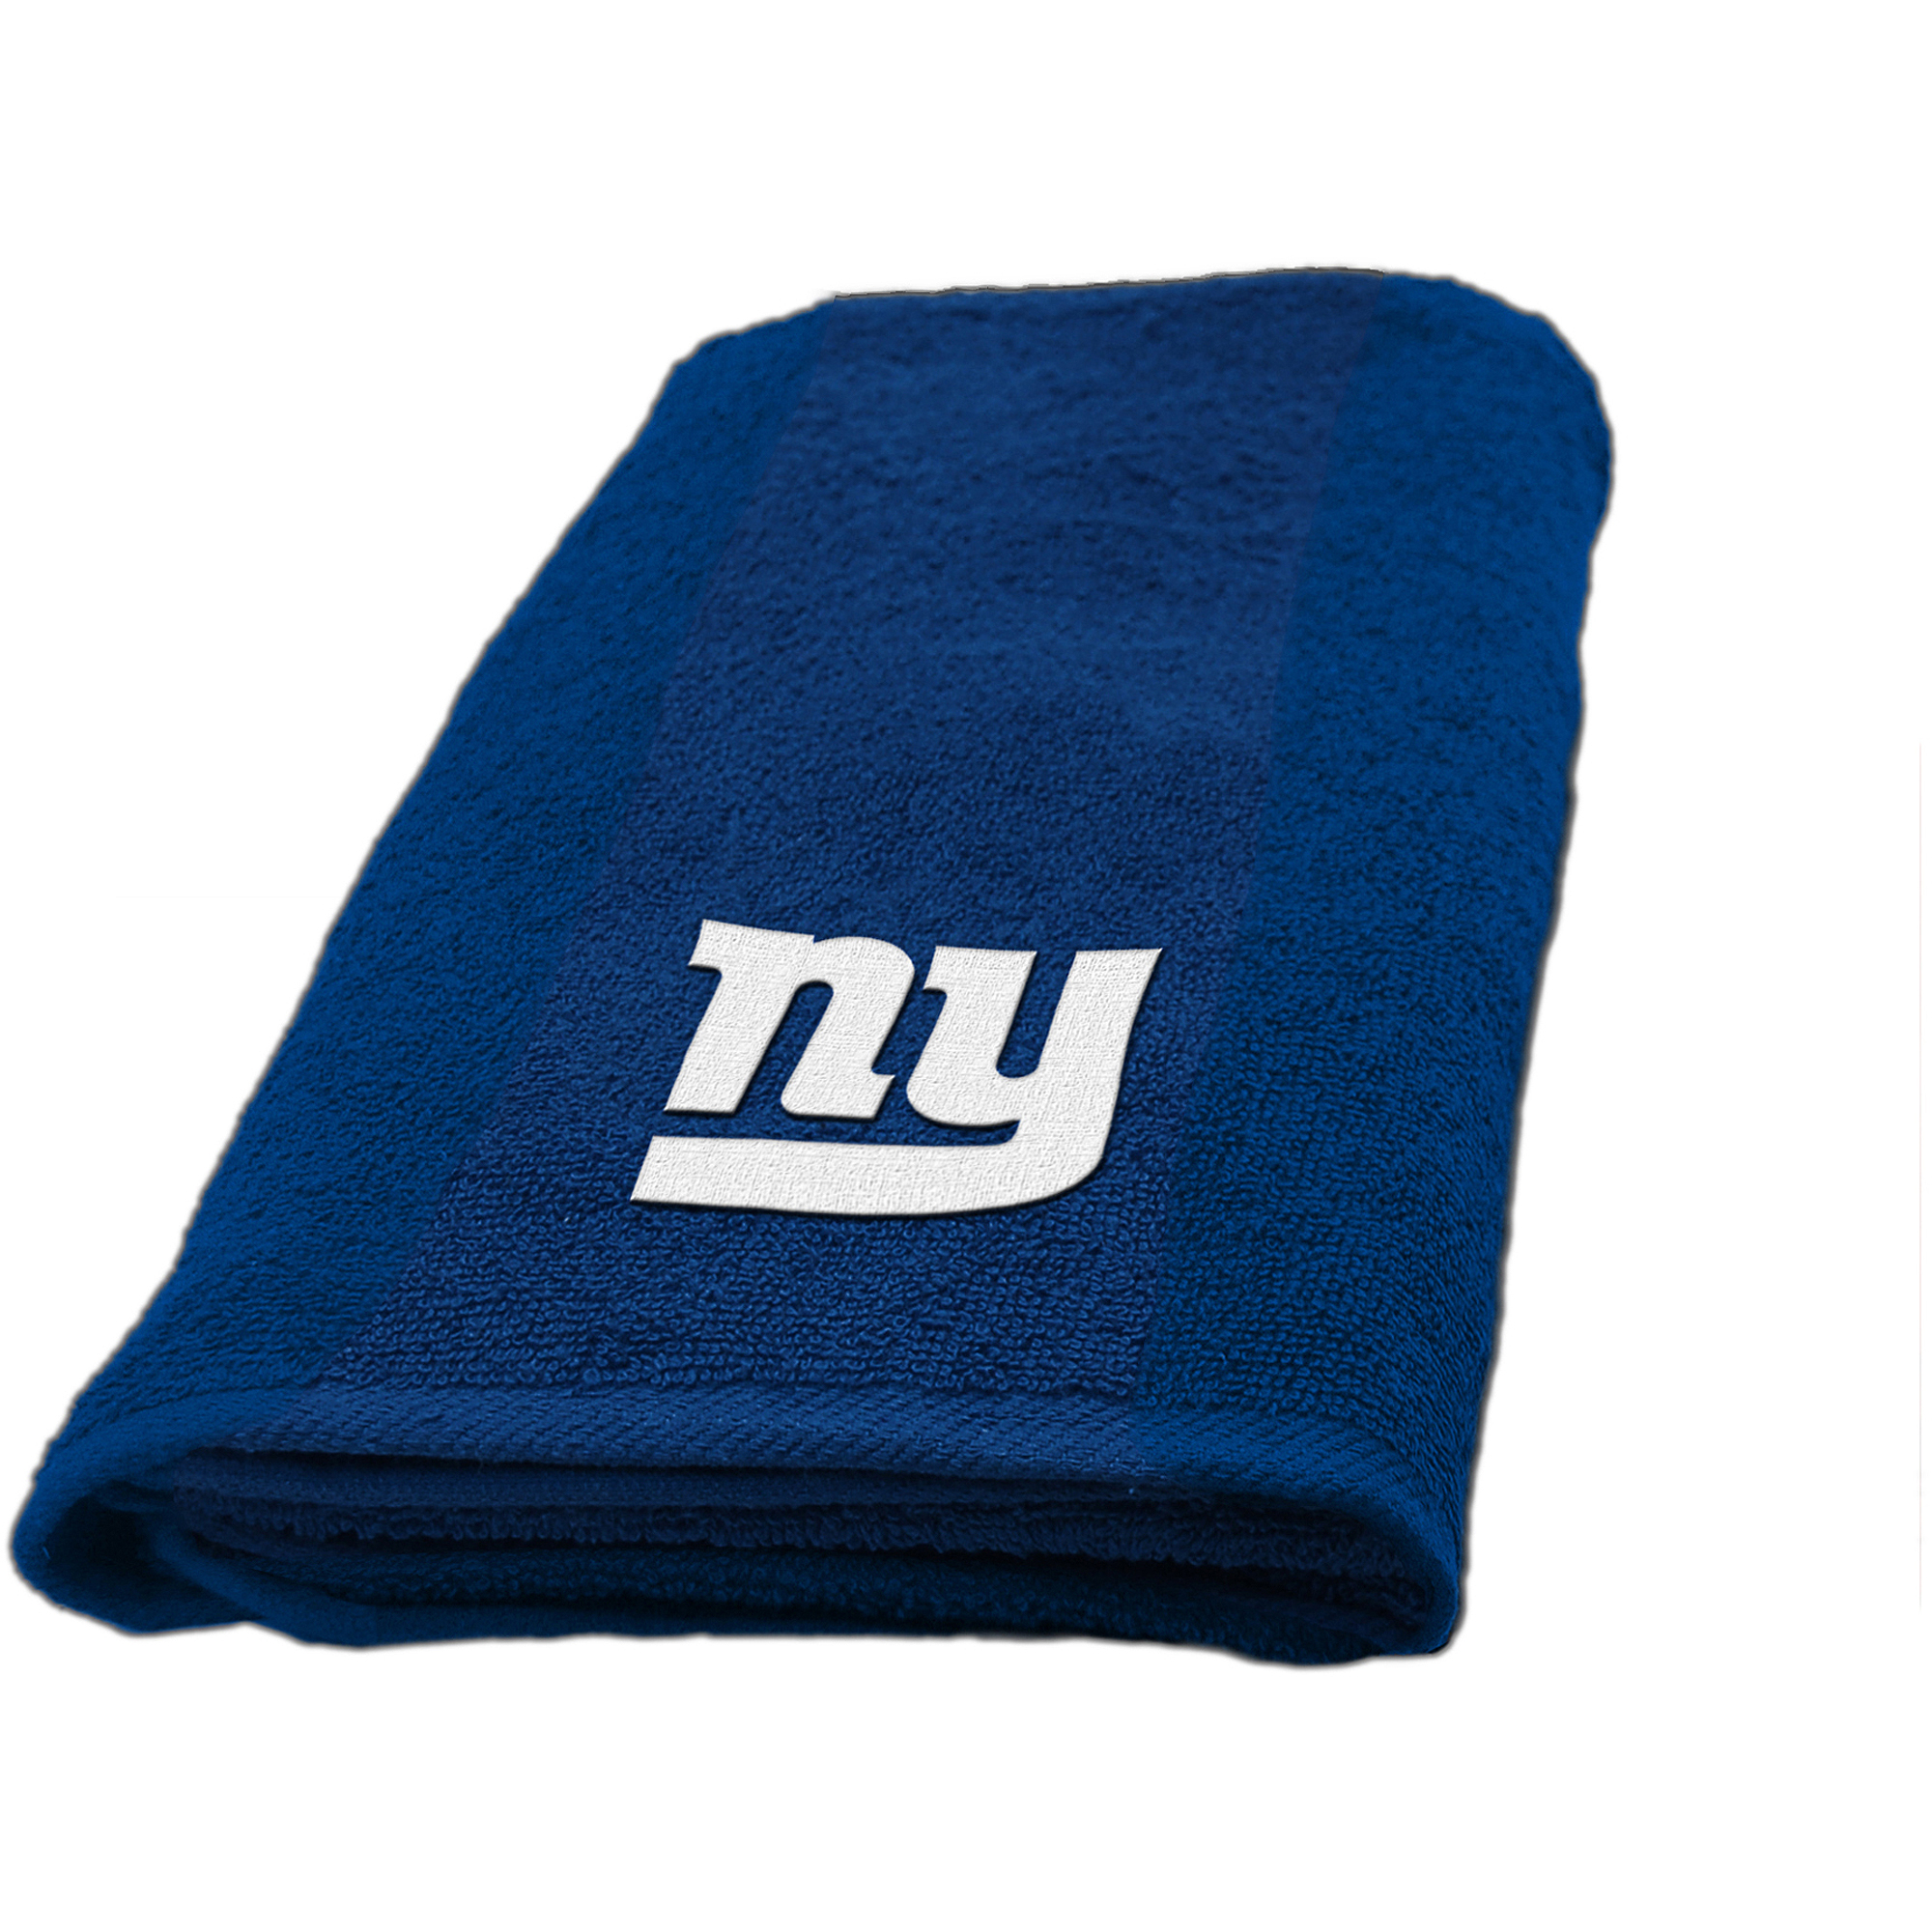 NFL New York Giants Decorative Bath Collection - Fingertip Towel